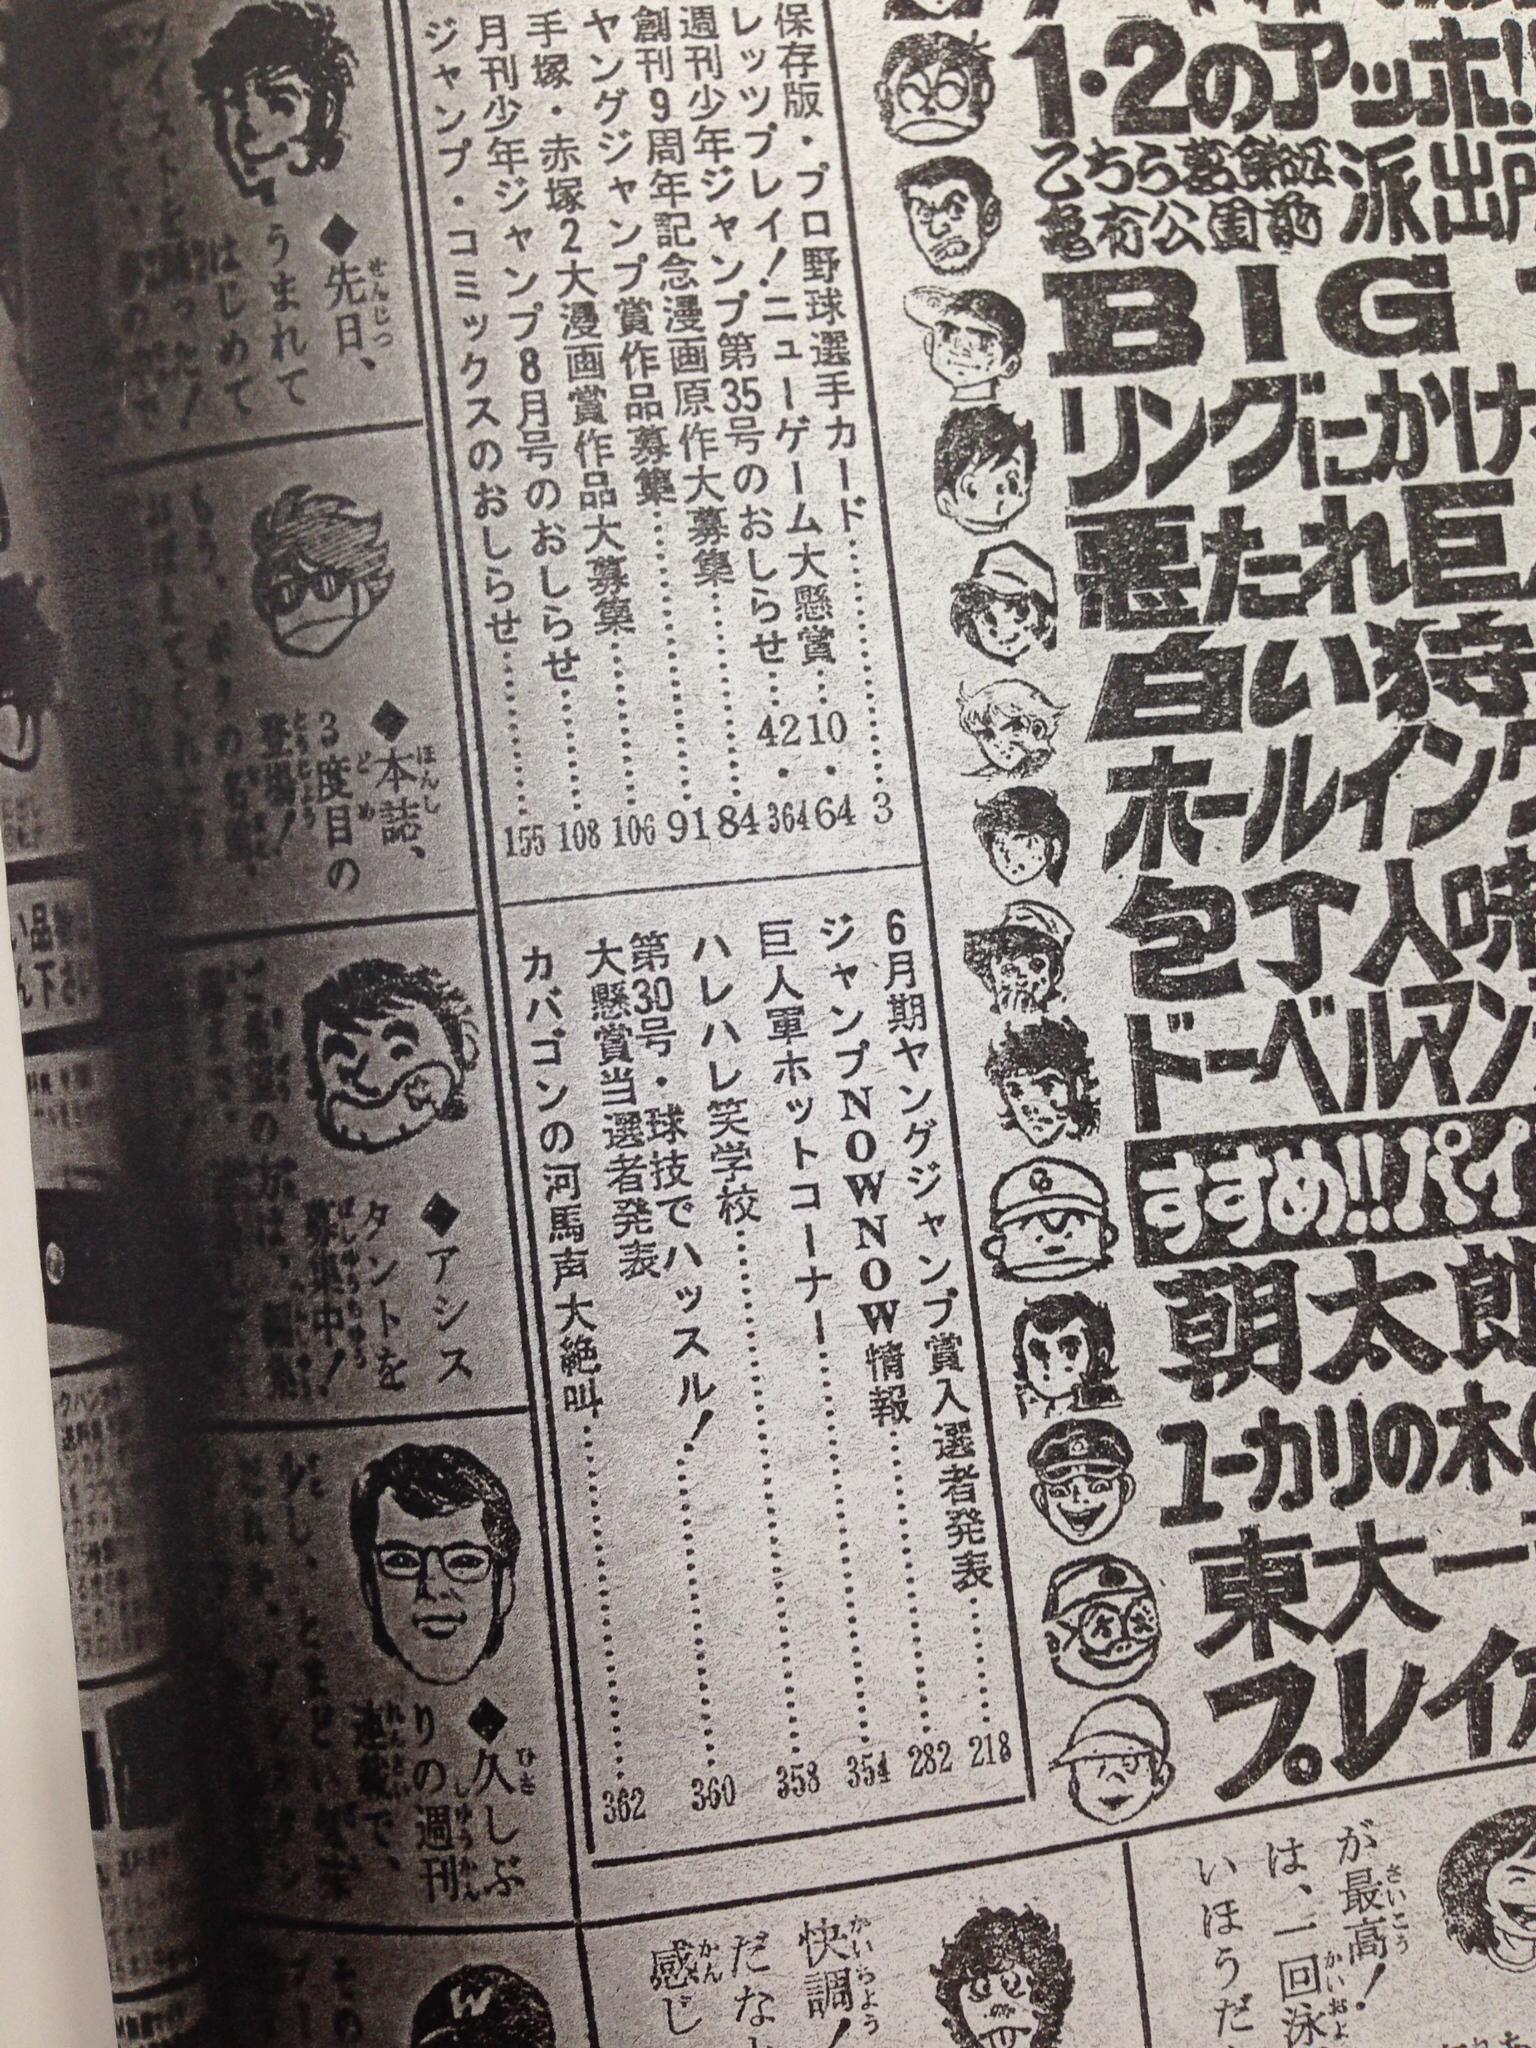 MIYAMOTO,Hirohito on Twitter: ...